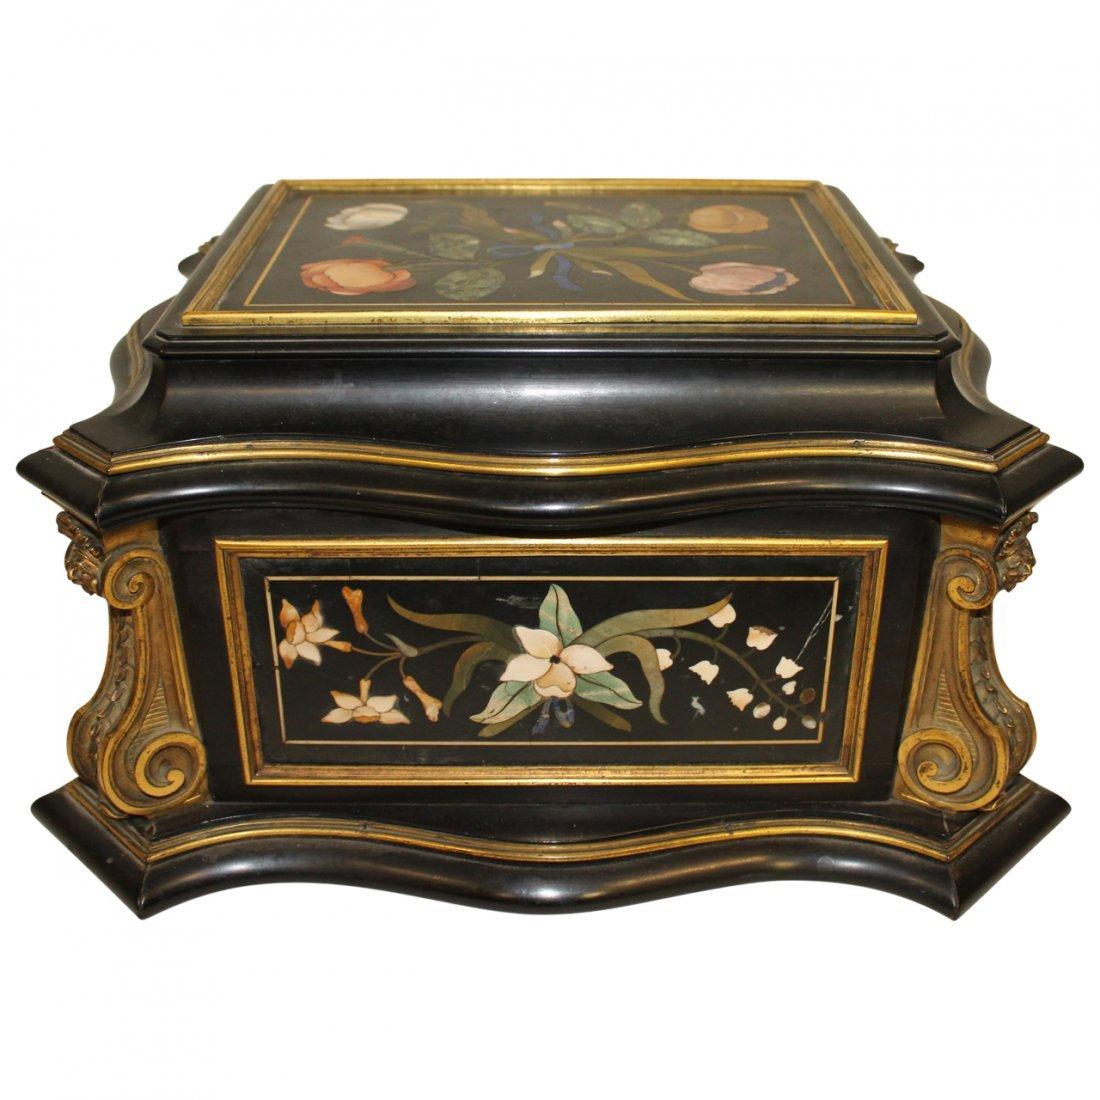 19th century Pietra Dura Casket